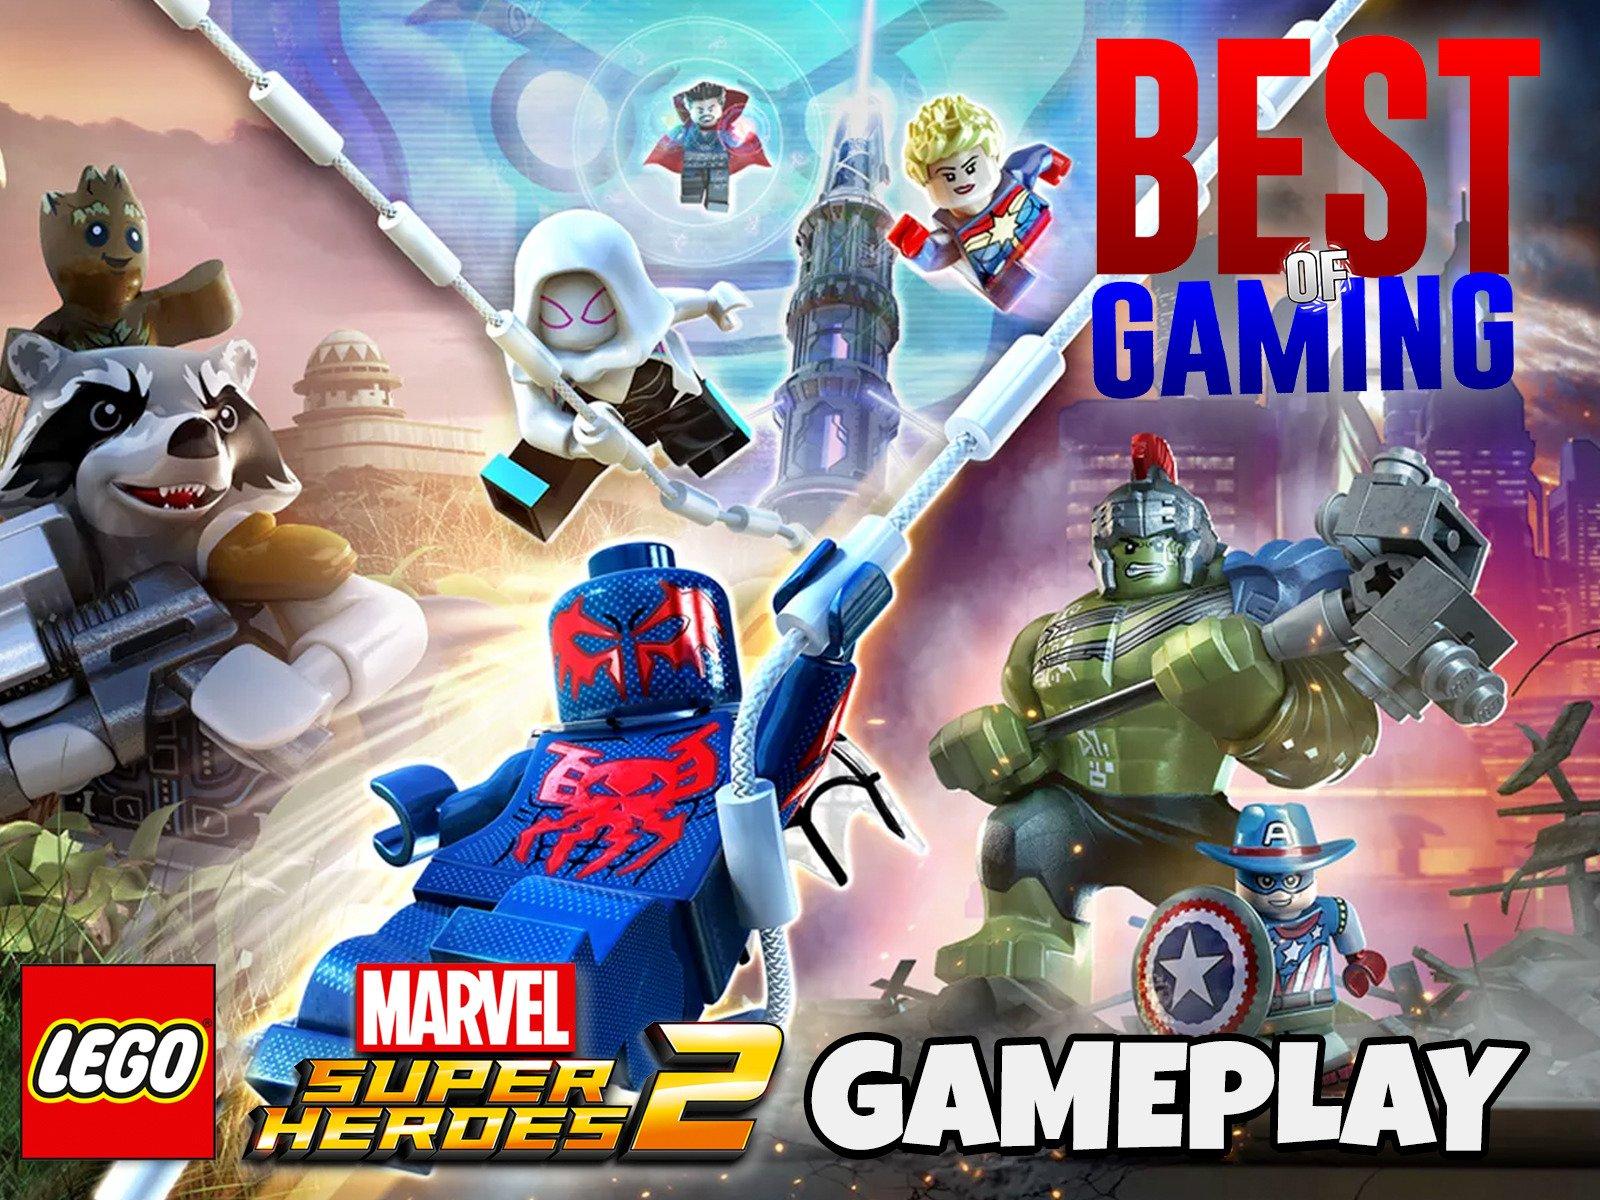 Clip: Lego Marvel Super Heroes 2 Gameplay - Season 1